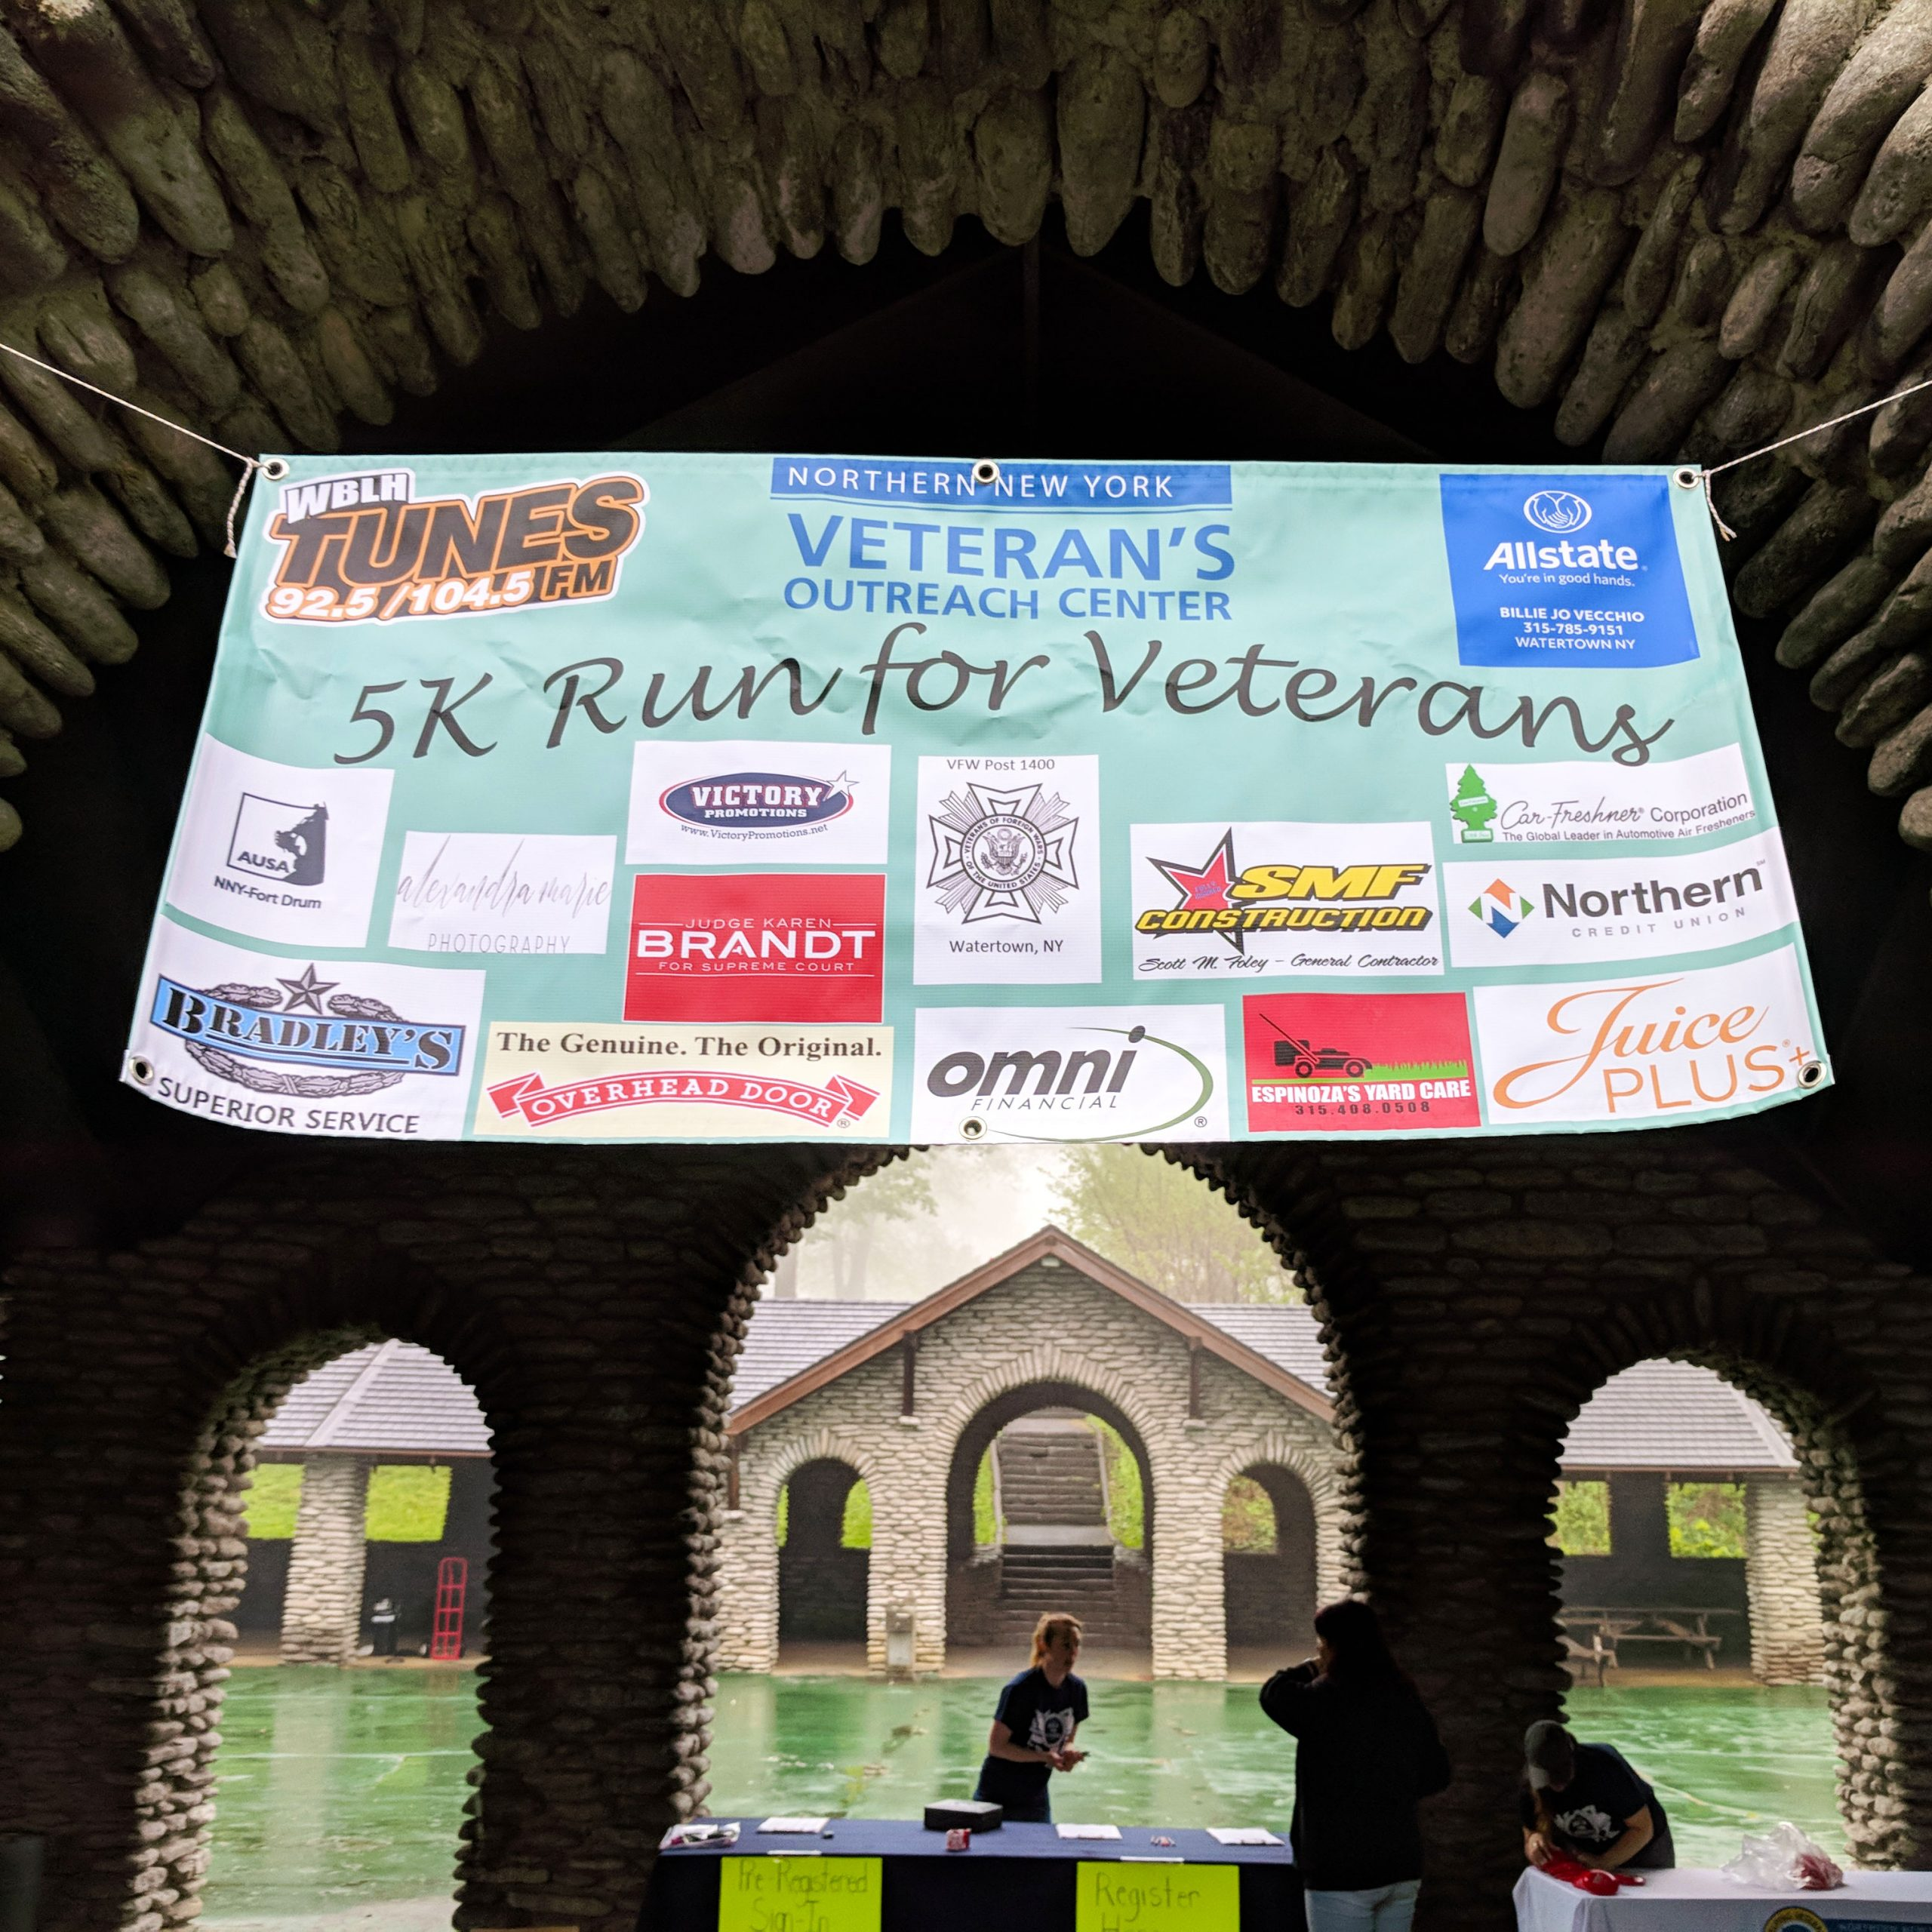 Veteran's Outreach Center 5k Run for Veterans